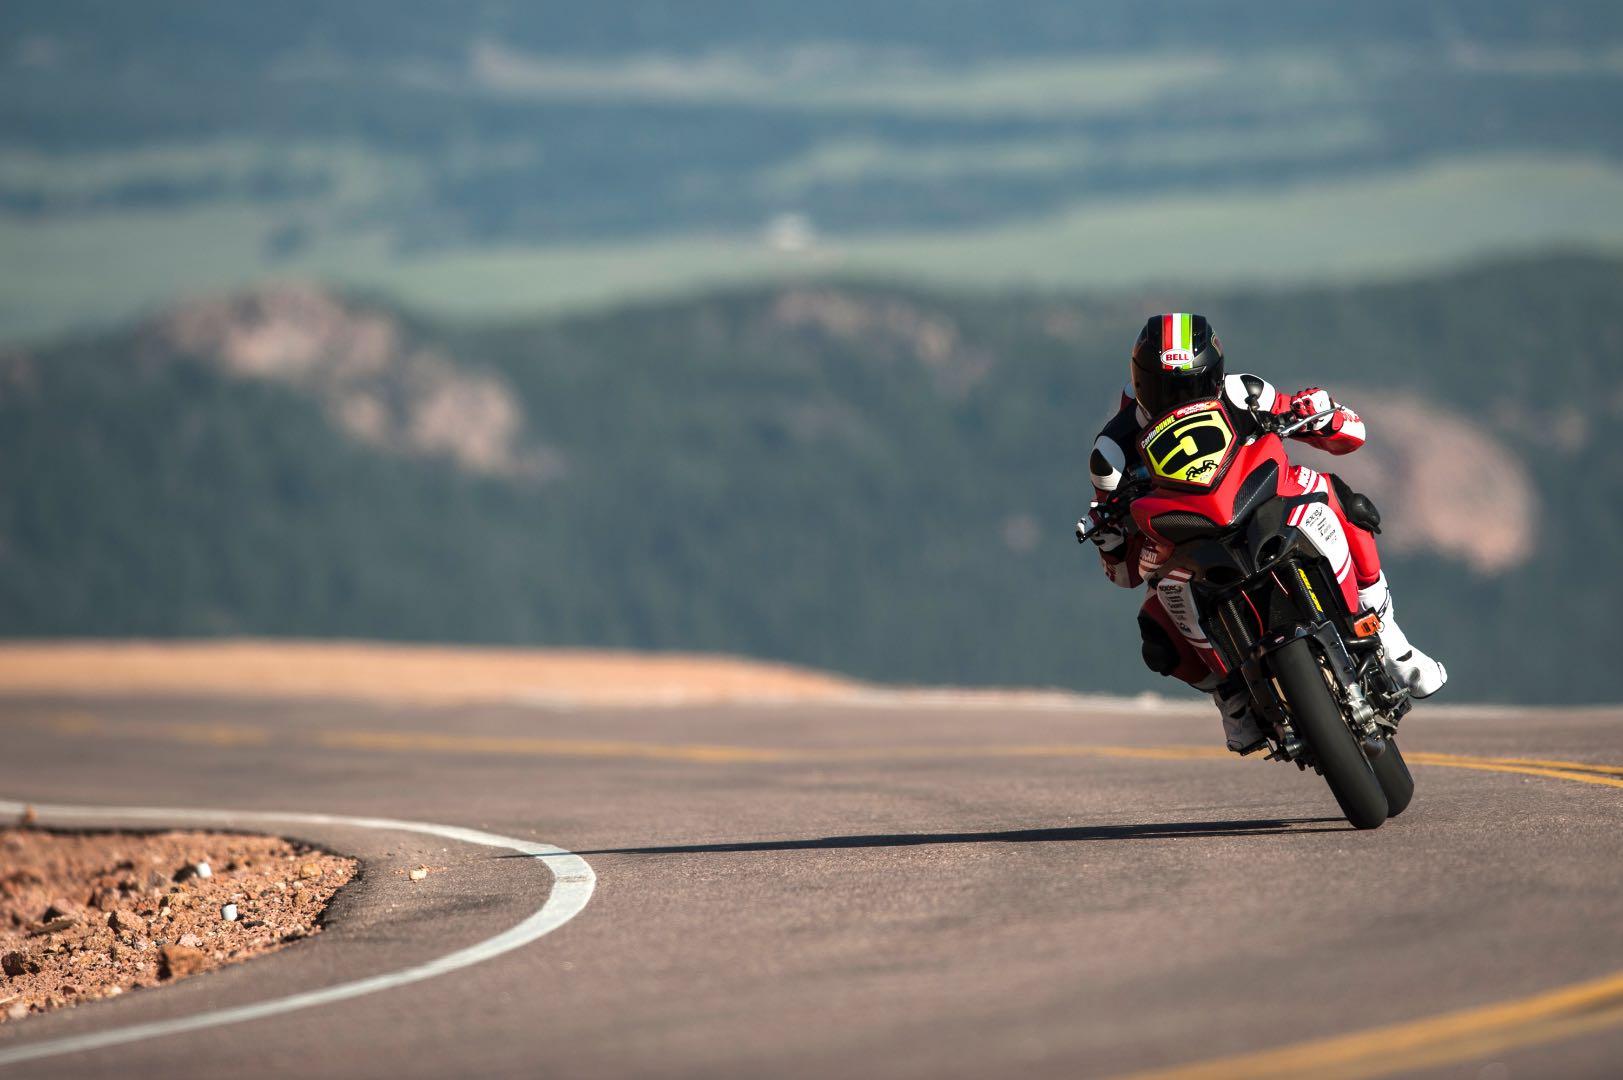 dunne sets record lap on Ducati Multistrada